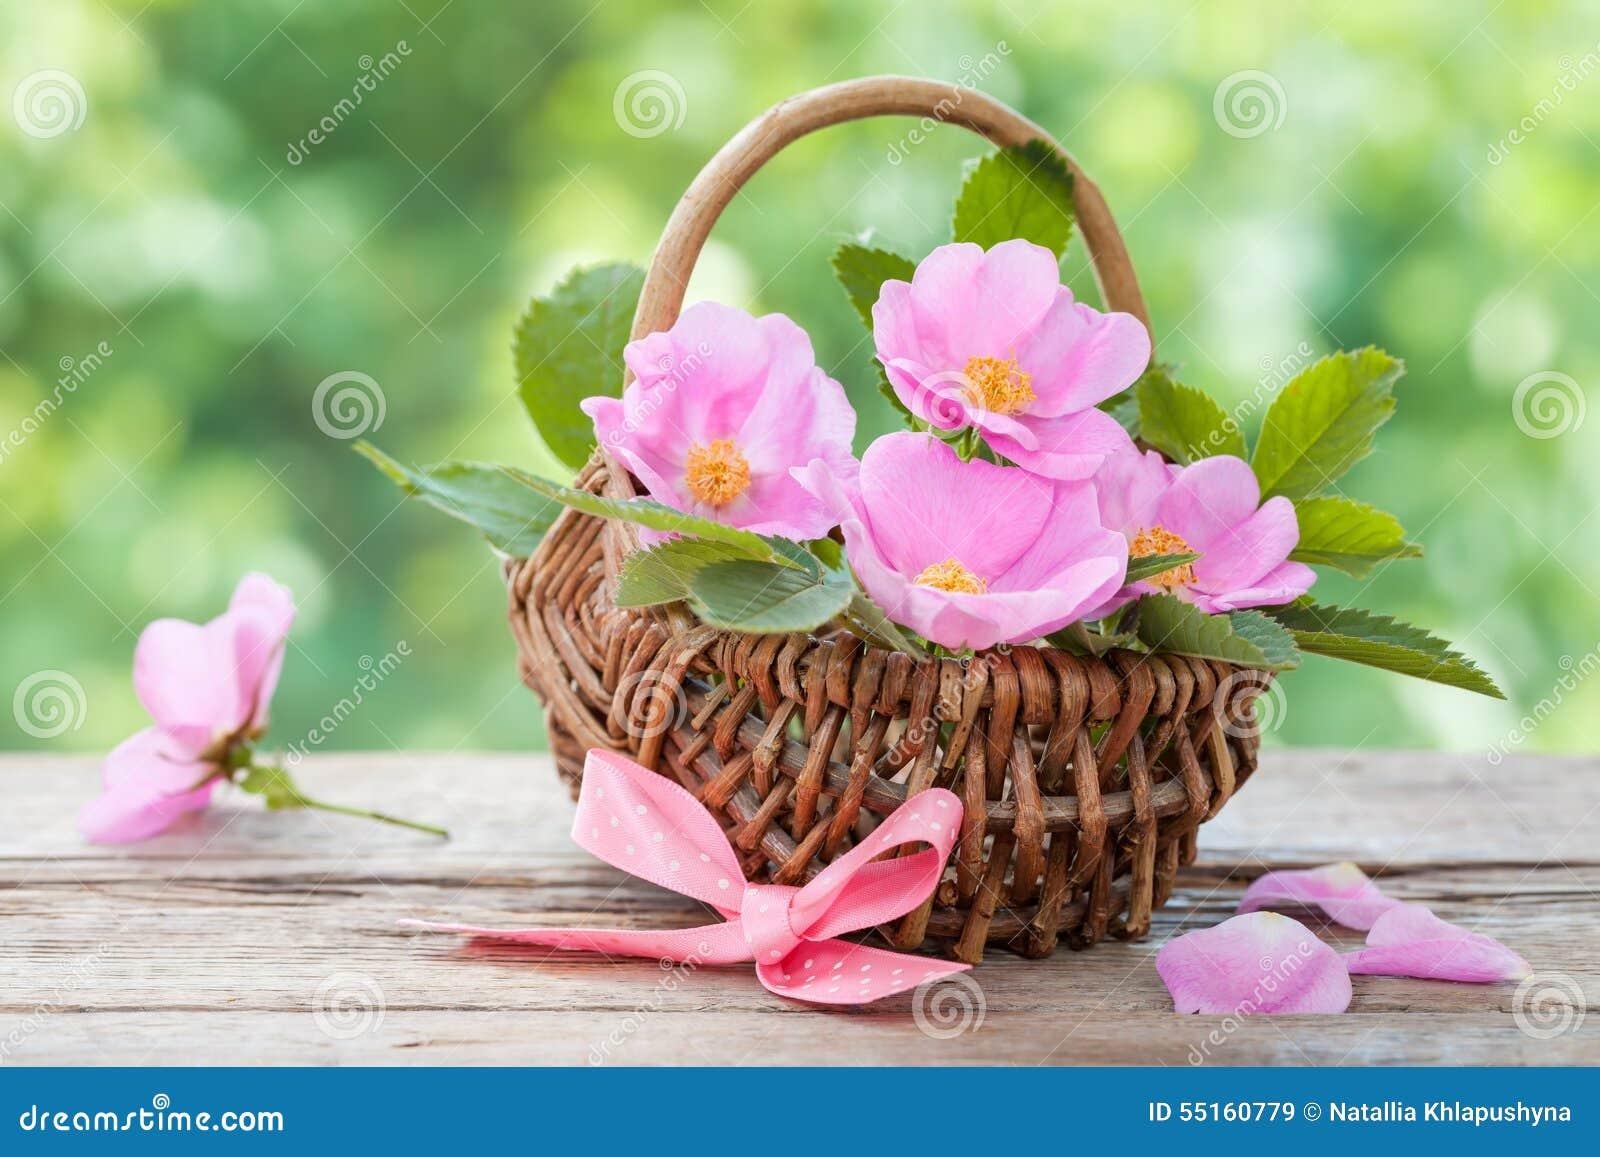 joli panier de fleur de mariage d'organza rose blanche